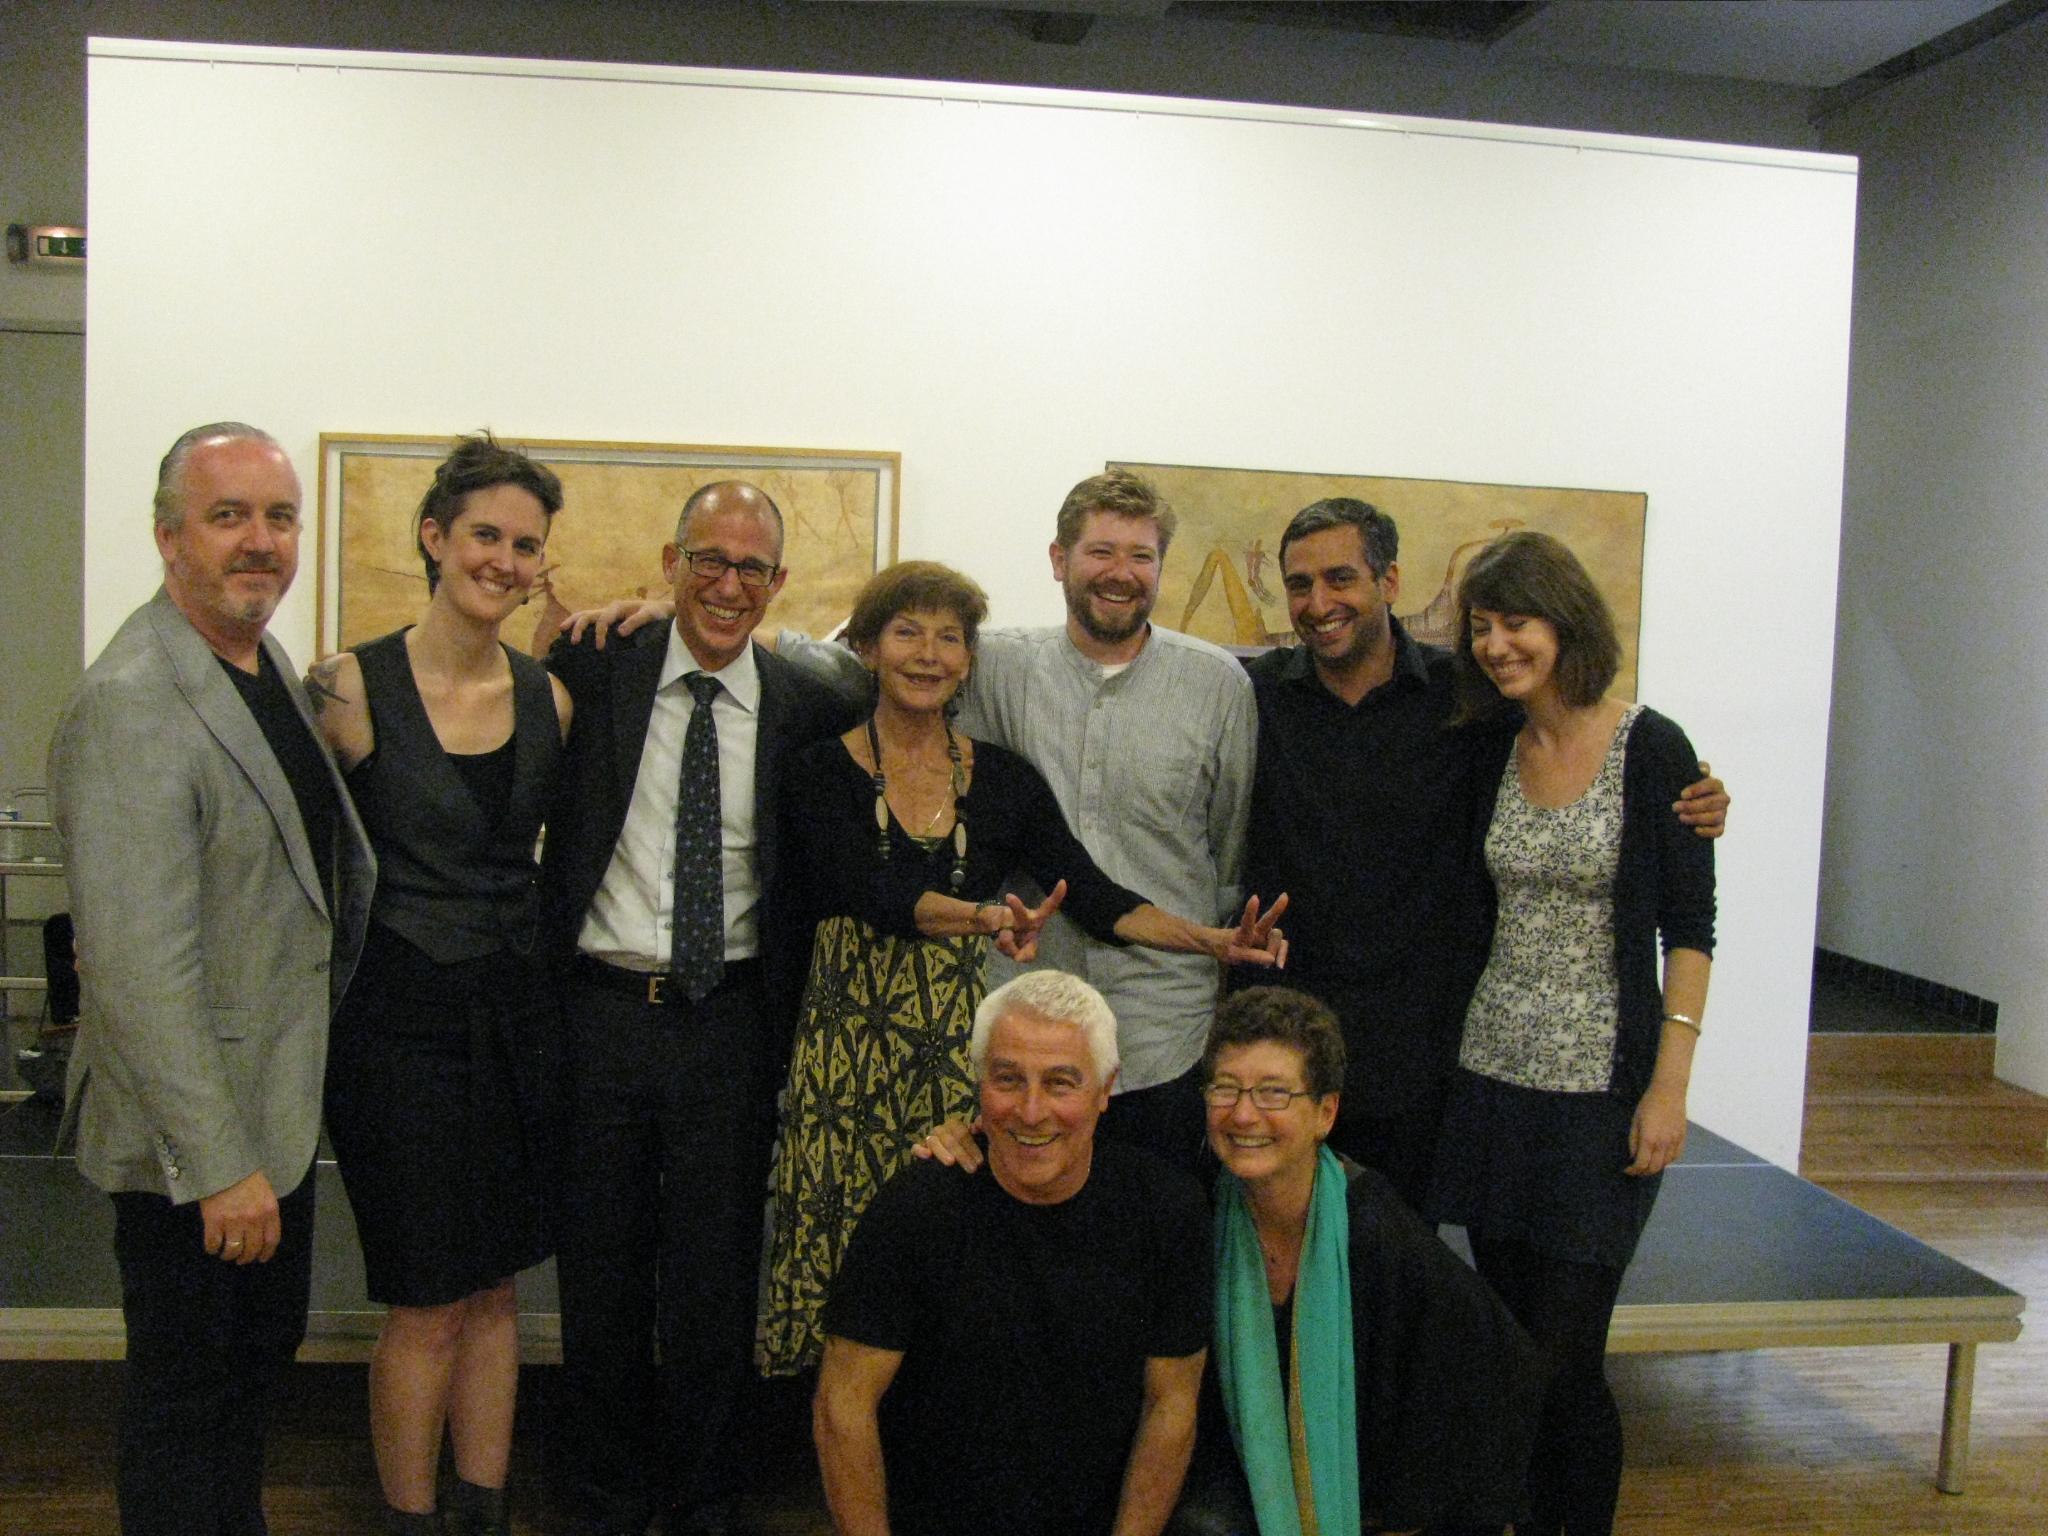 Left to right: Dwyer, Campanello, Tonus, Scheer, Davis-Van Atta, Medin, LaRue, Guy and Homburger (front). 26 June, 2014. Goethe-Institut Paris. Photo: Barra Ó Seaghdha.